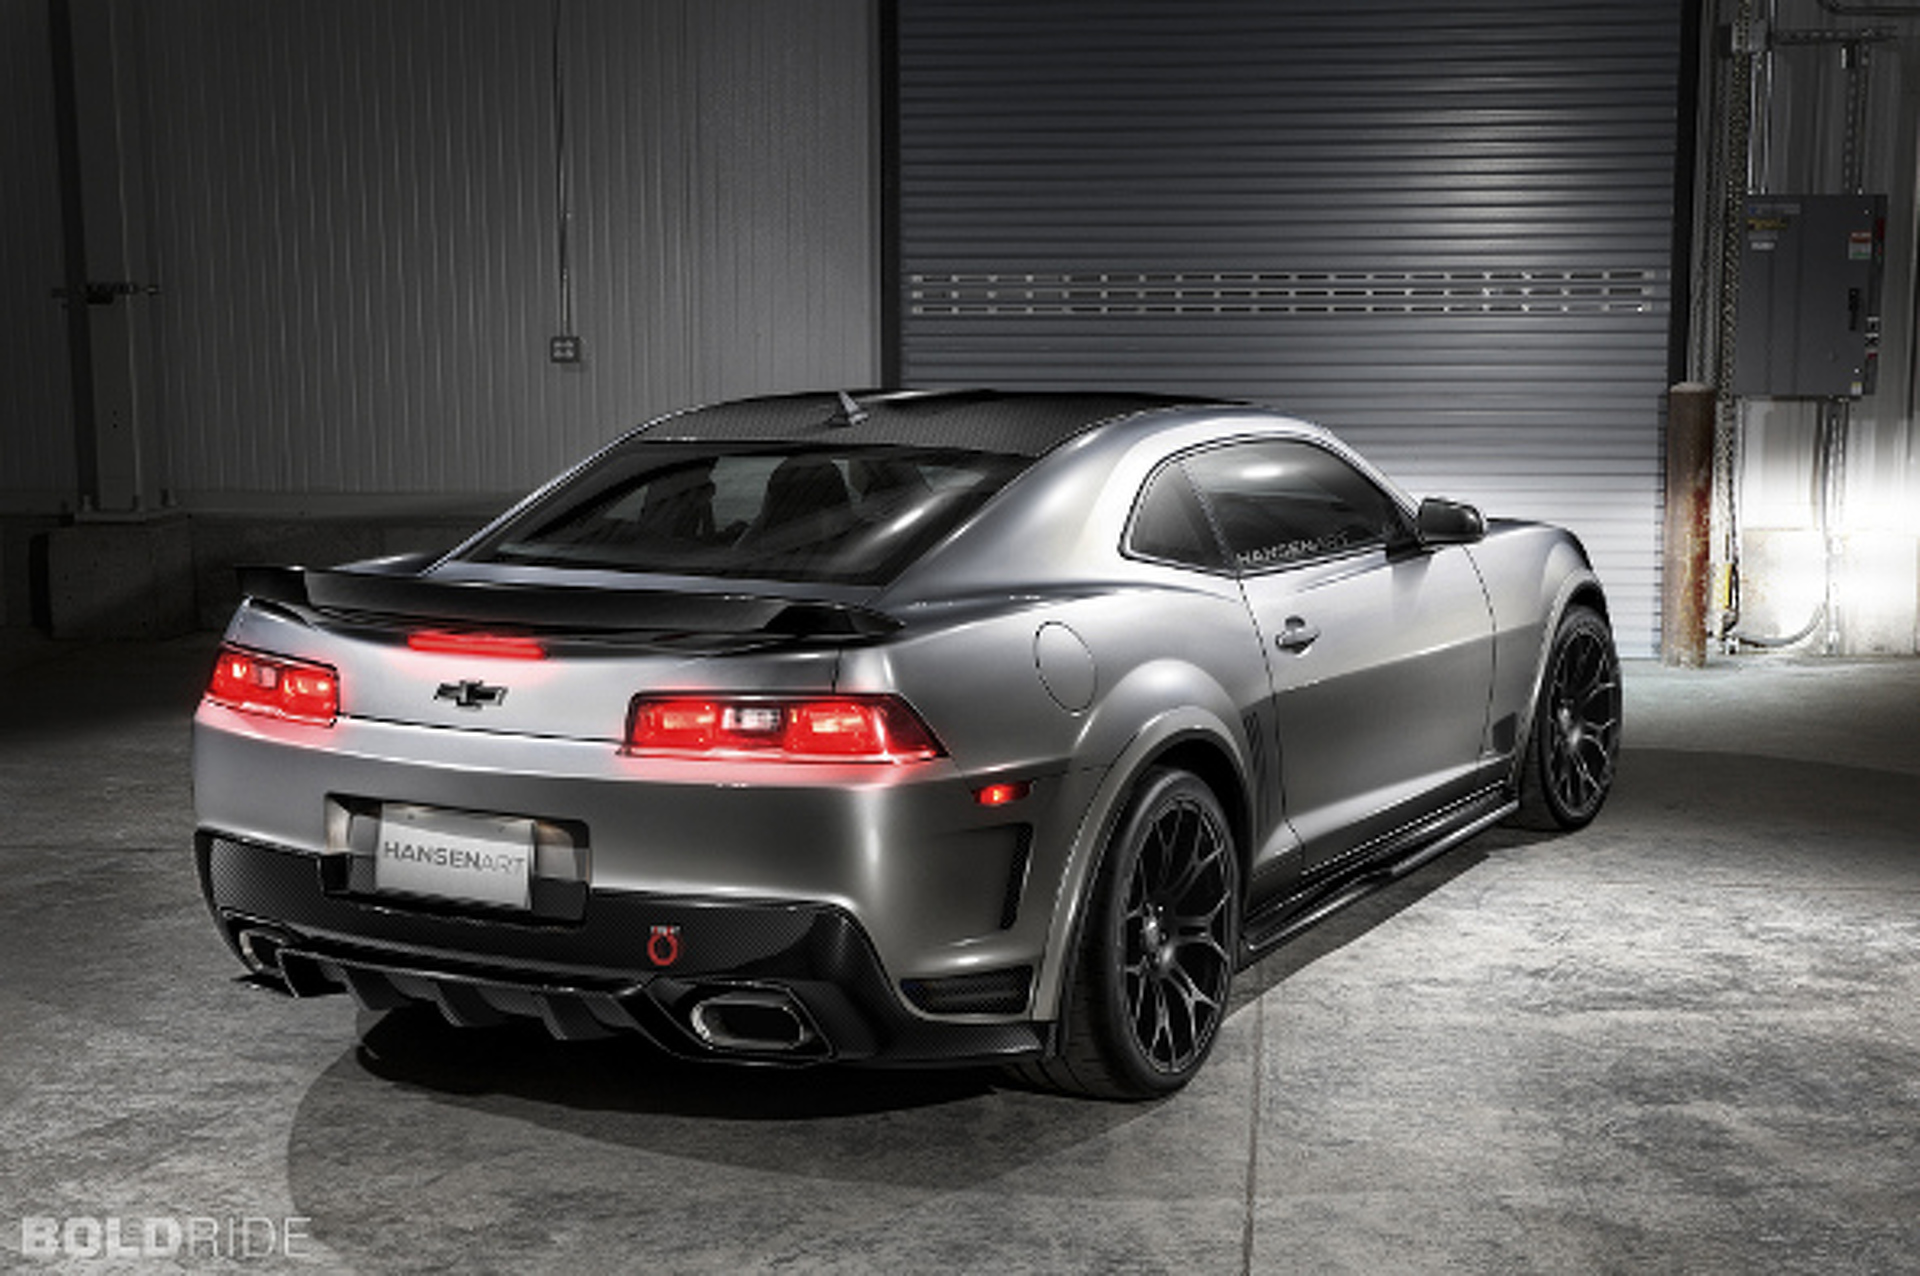 2014 Chevrolet Camaro Carbon Line Concept